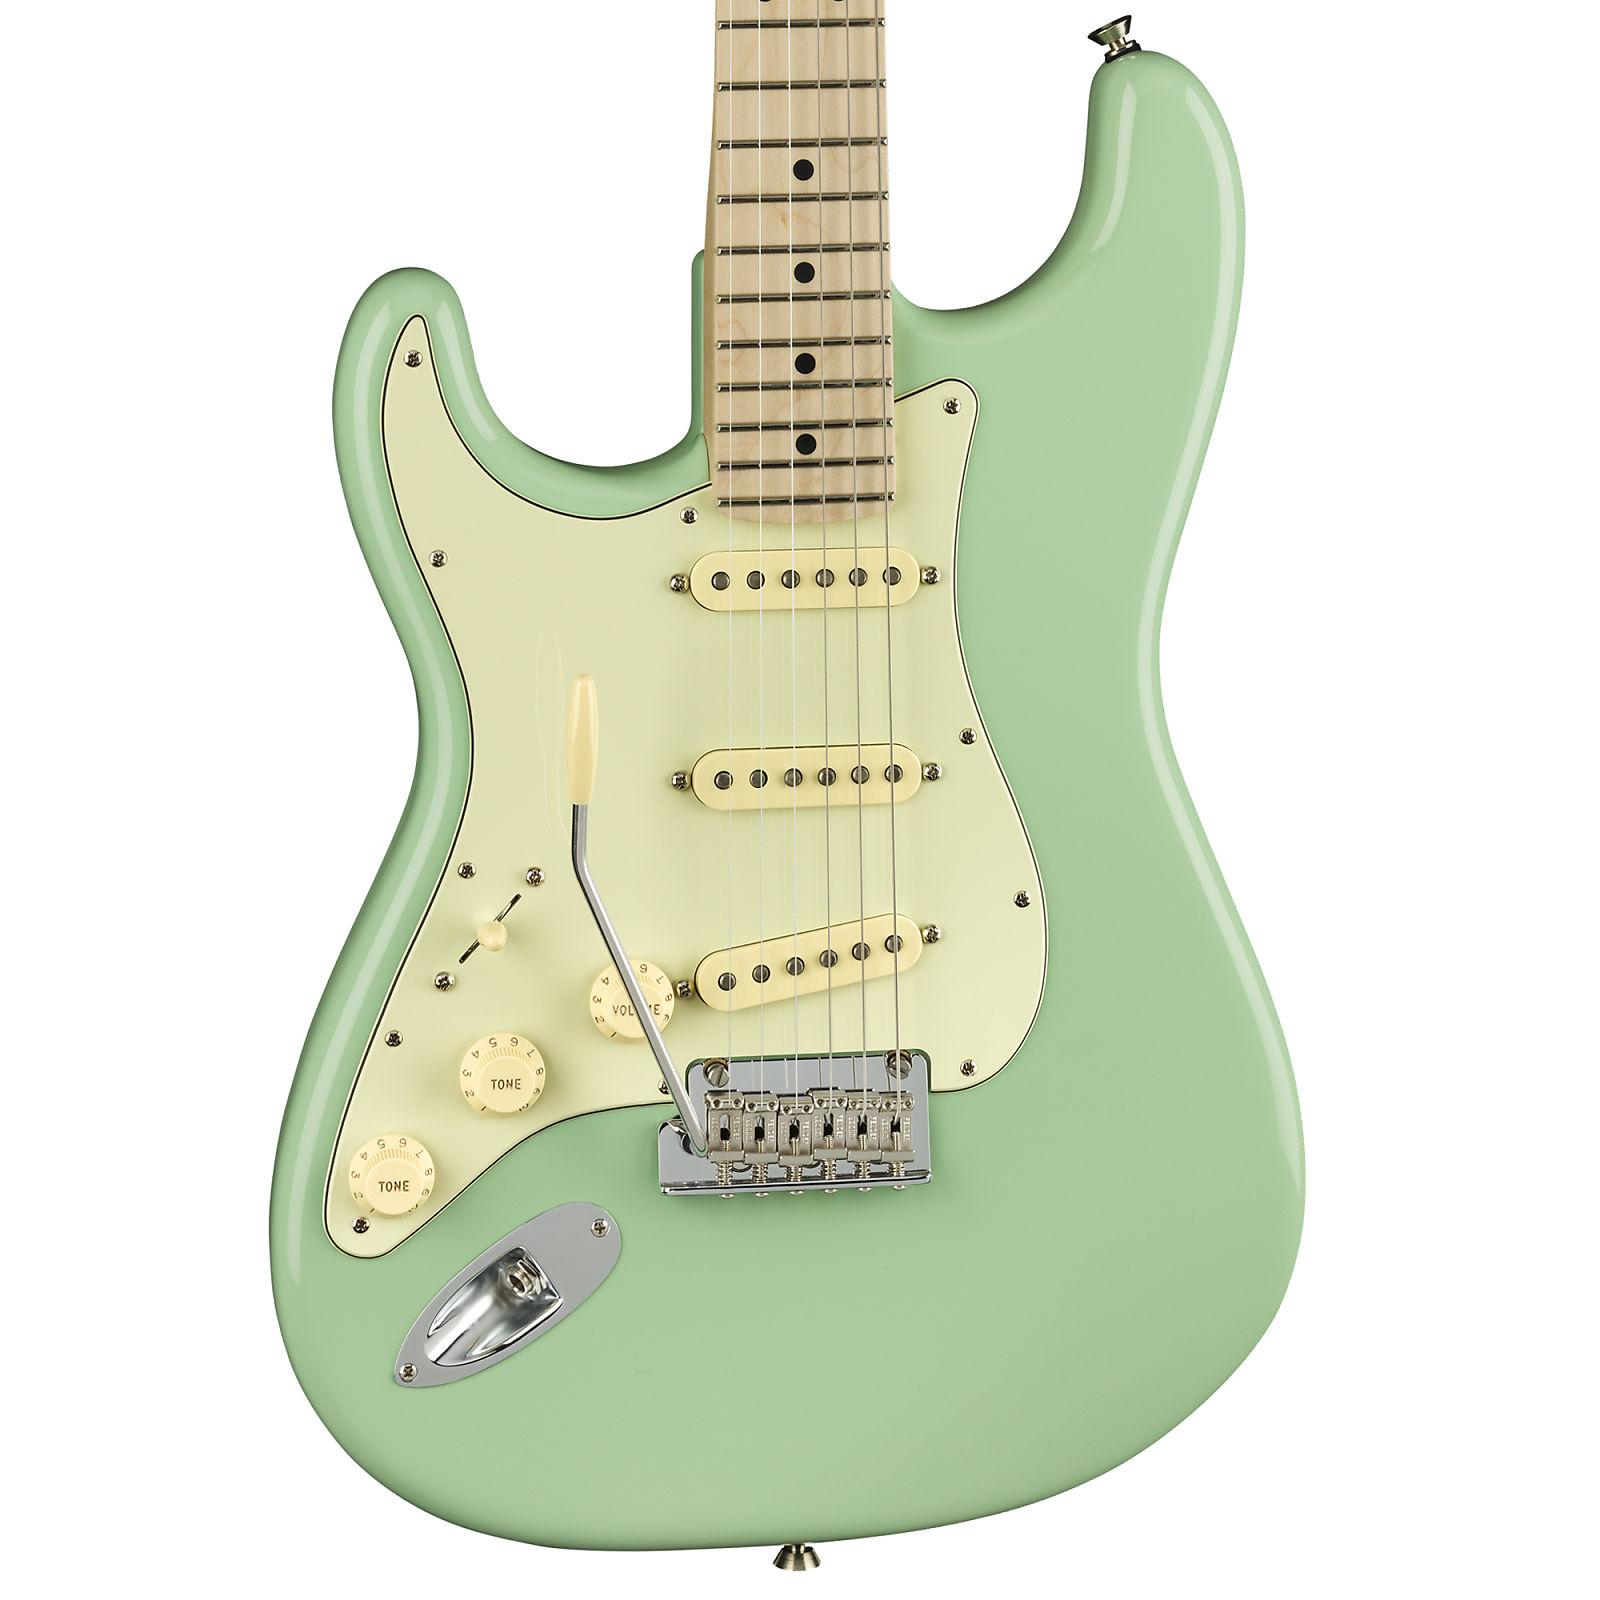 Fender Limited American Pro Stratocaster Lefty Surf Green Pre Order